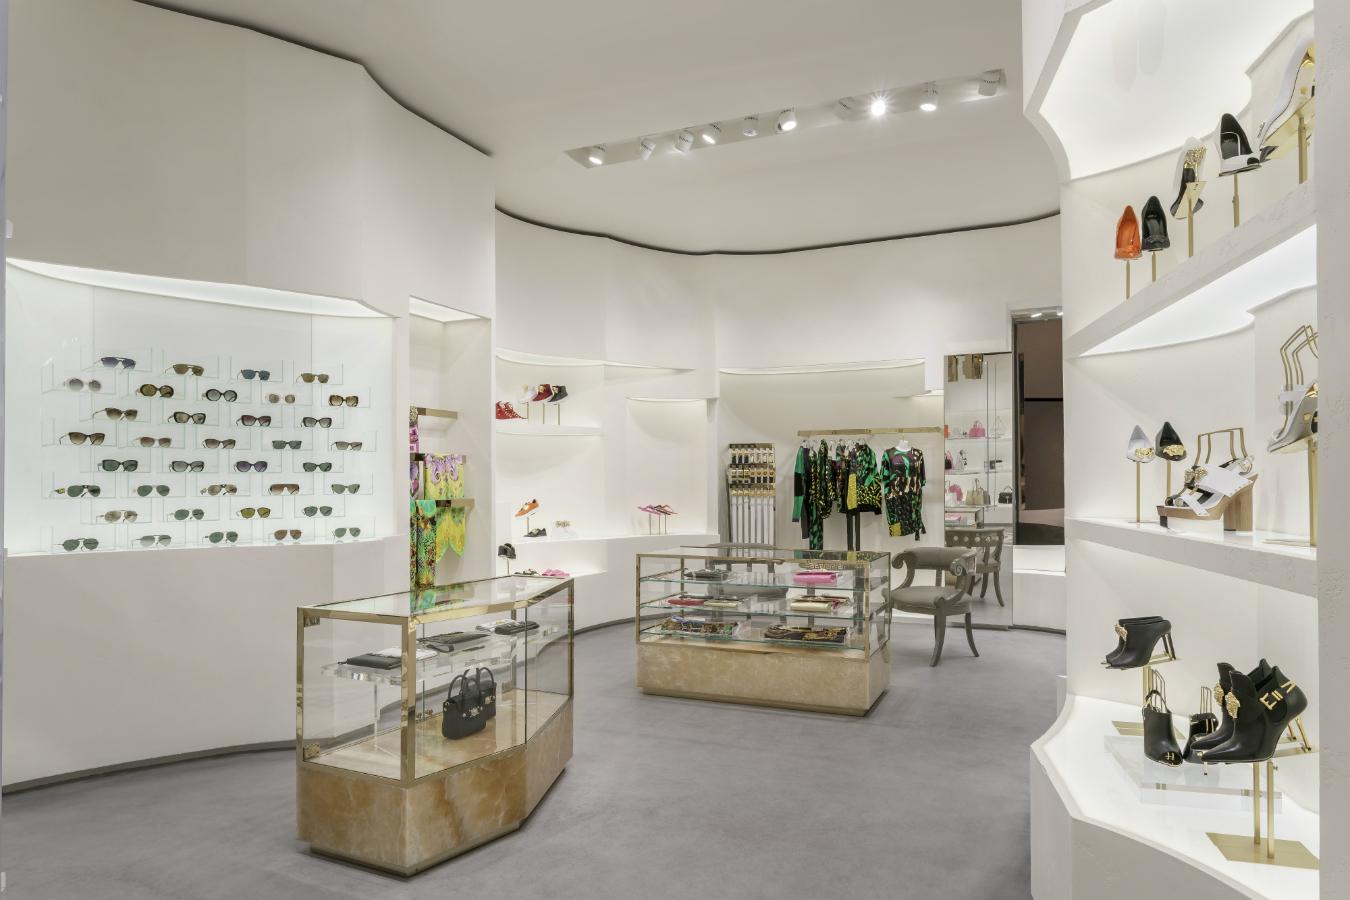 Vancouver Versace Boutique Montecristo